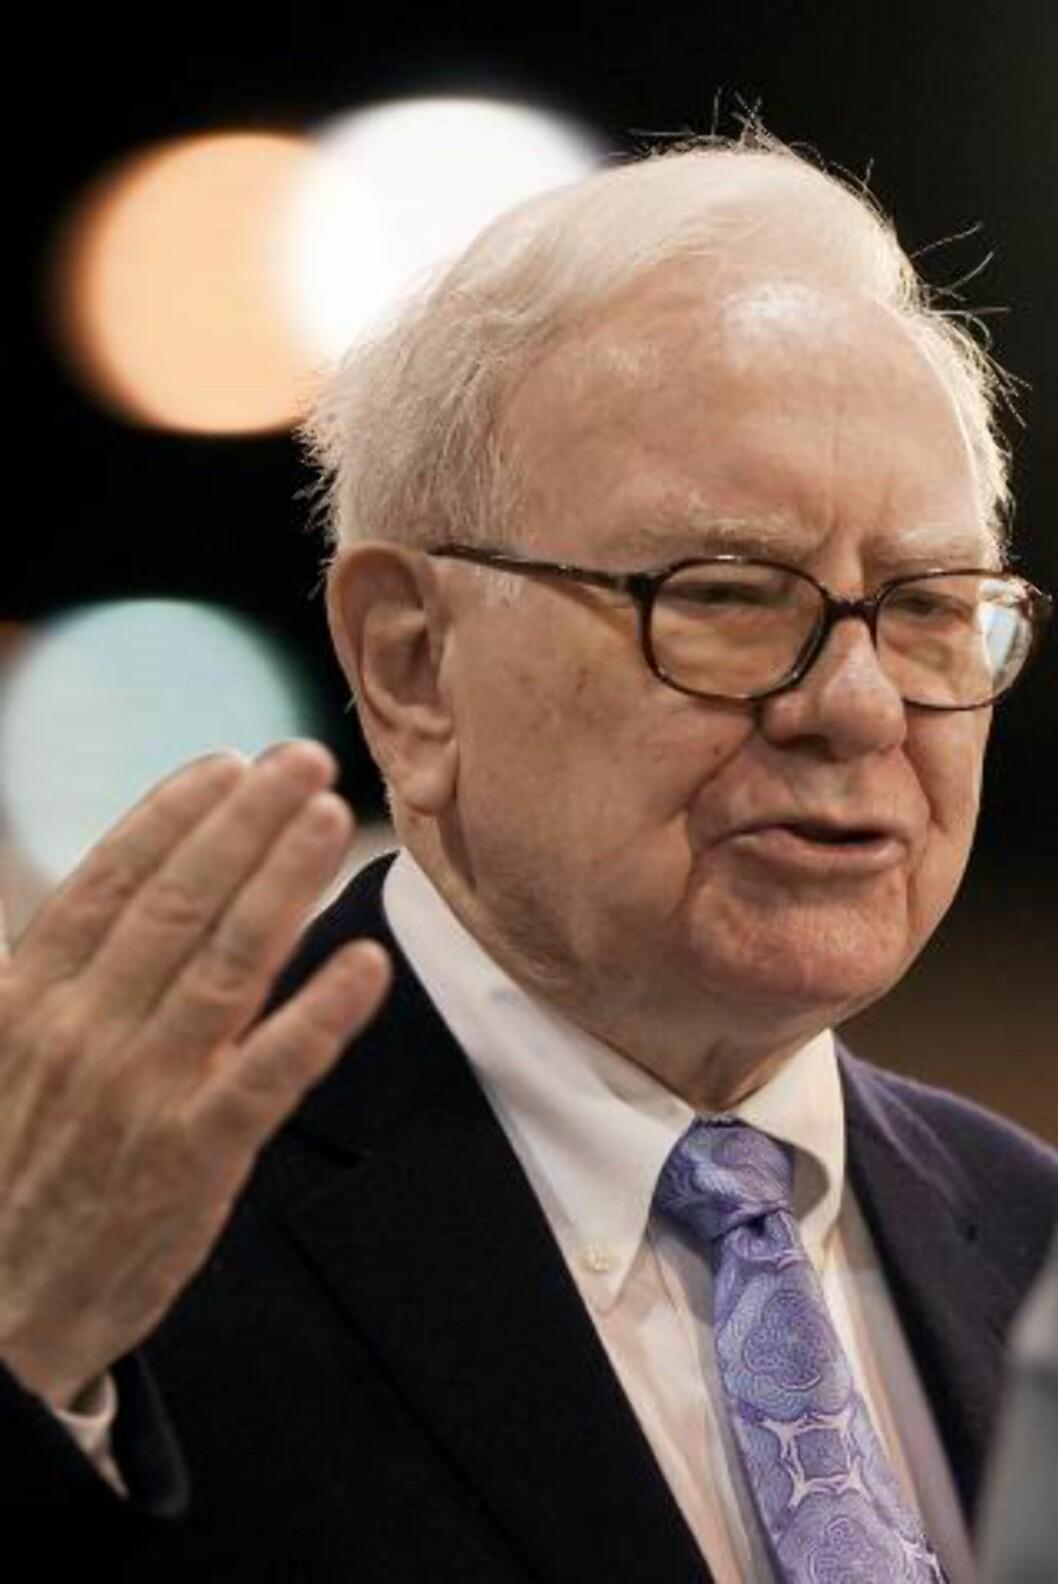 <strong>TREDJE RIKESTE:</strong> Warren Buffett i investorselskapet Berkshire Hathaway er verdens tredje rikeste, ifølge Forbes. Foto: AP Photo/Nati Harnik/Scanpix